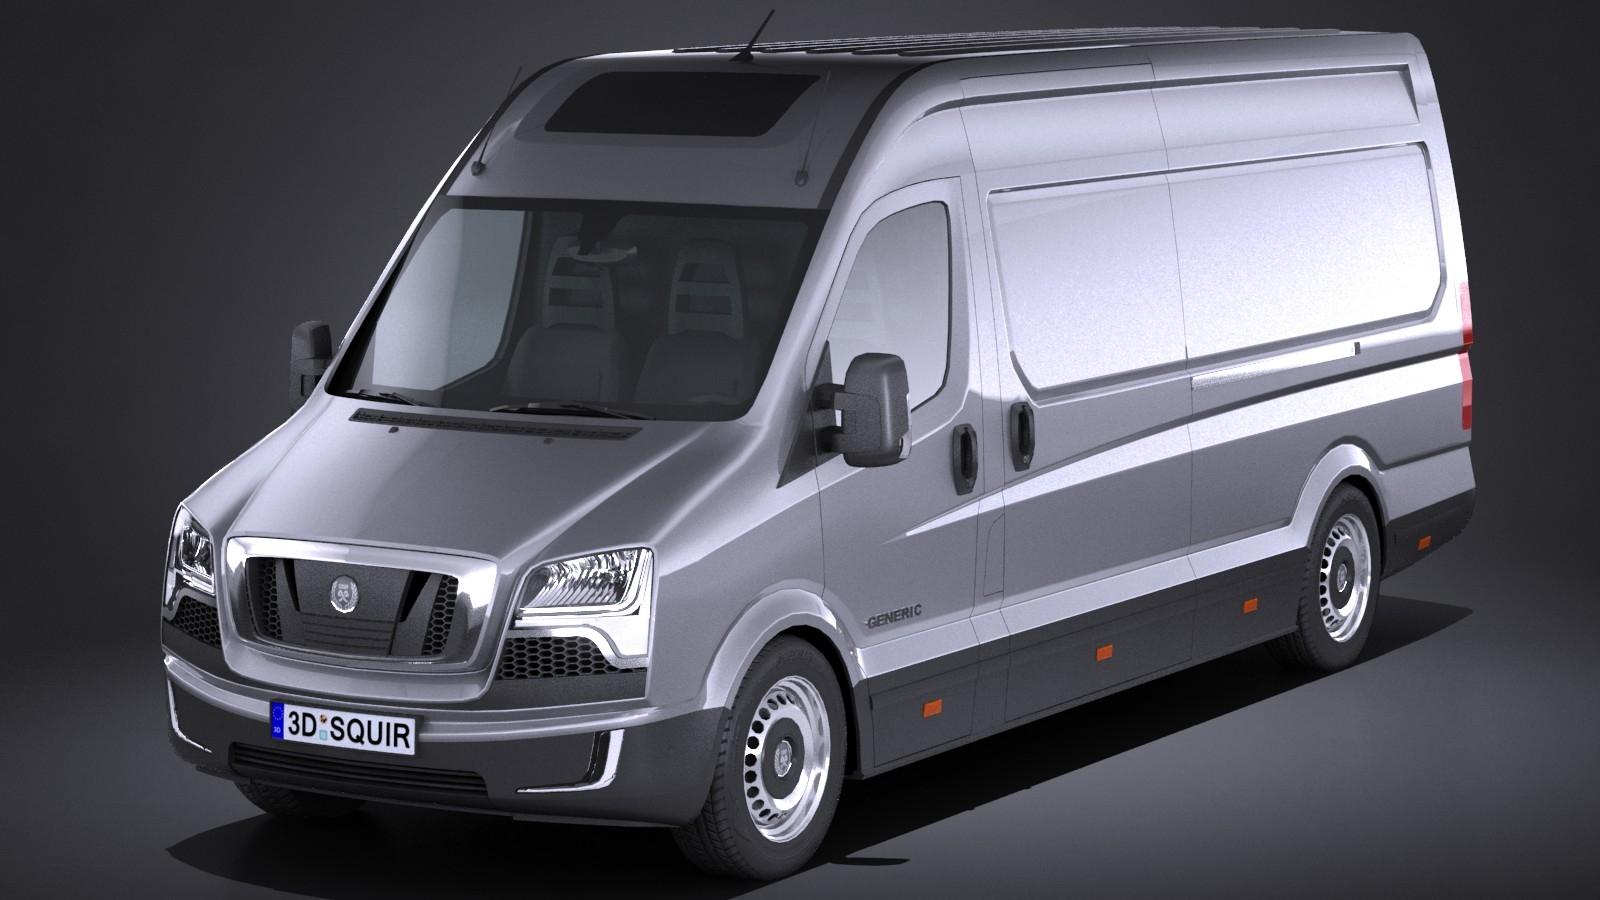 LowPoly Generic Big Van 2016